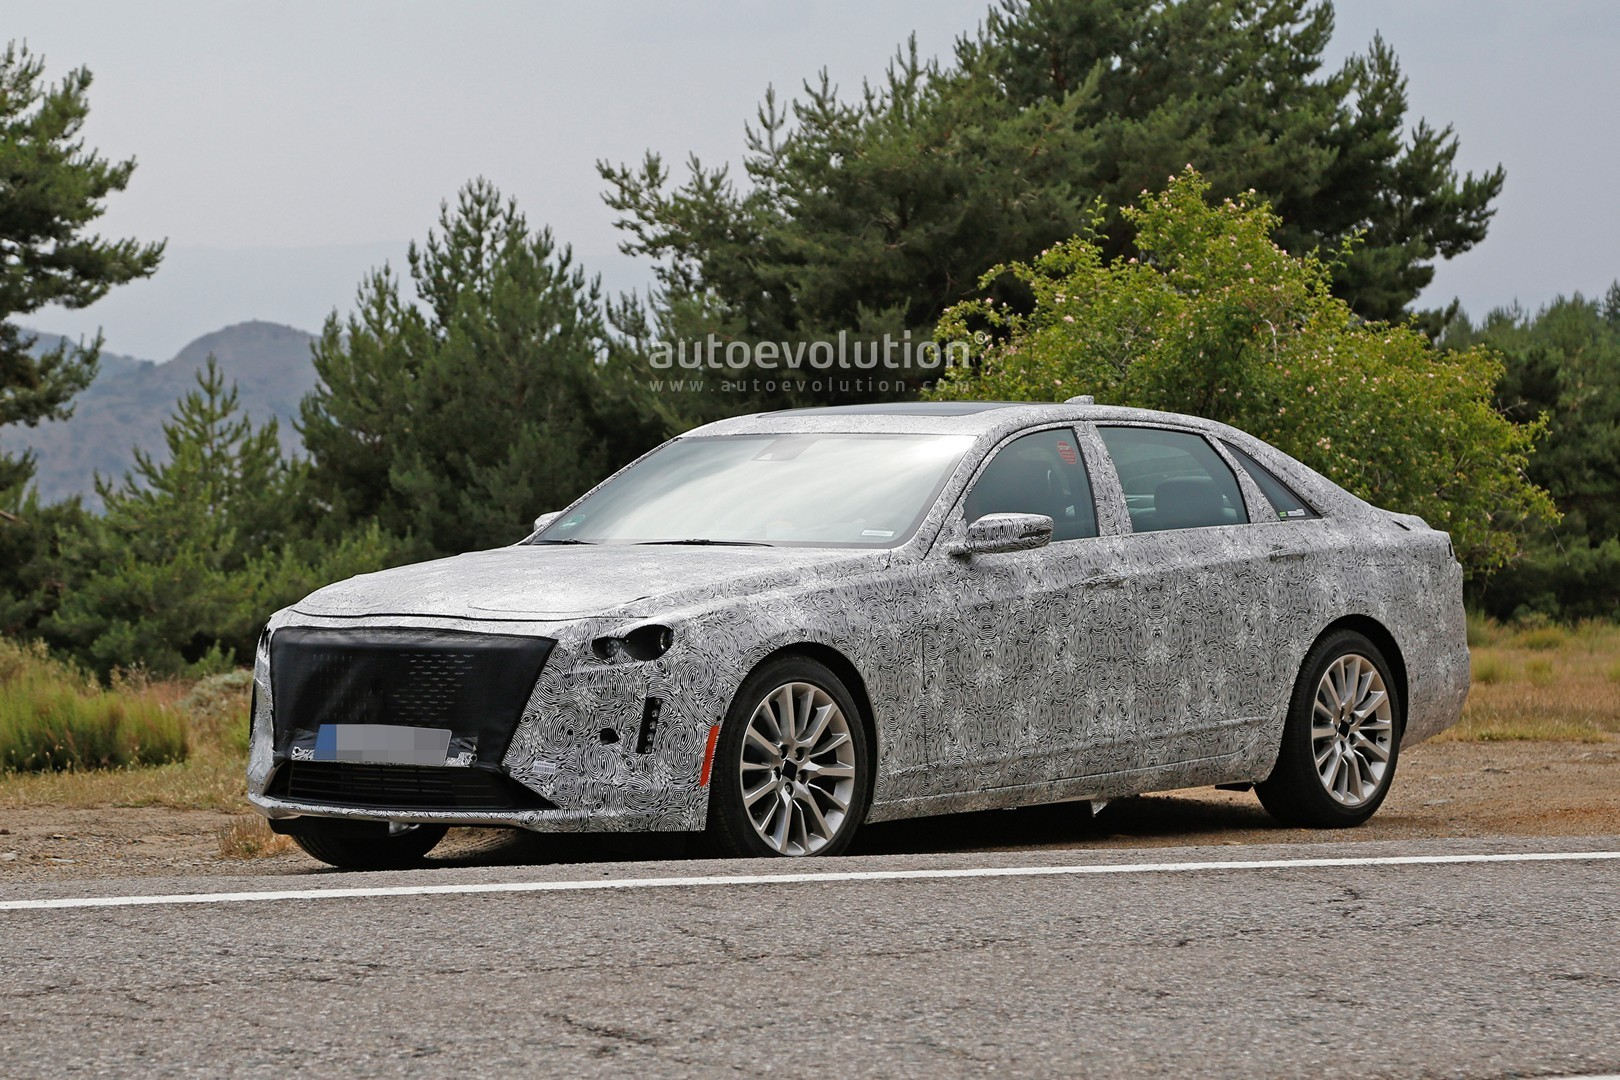 2019 Cadillac CT6 Facelift Makes Spyshots Debut, Has ...